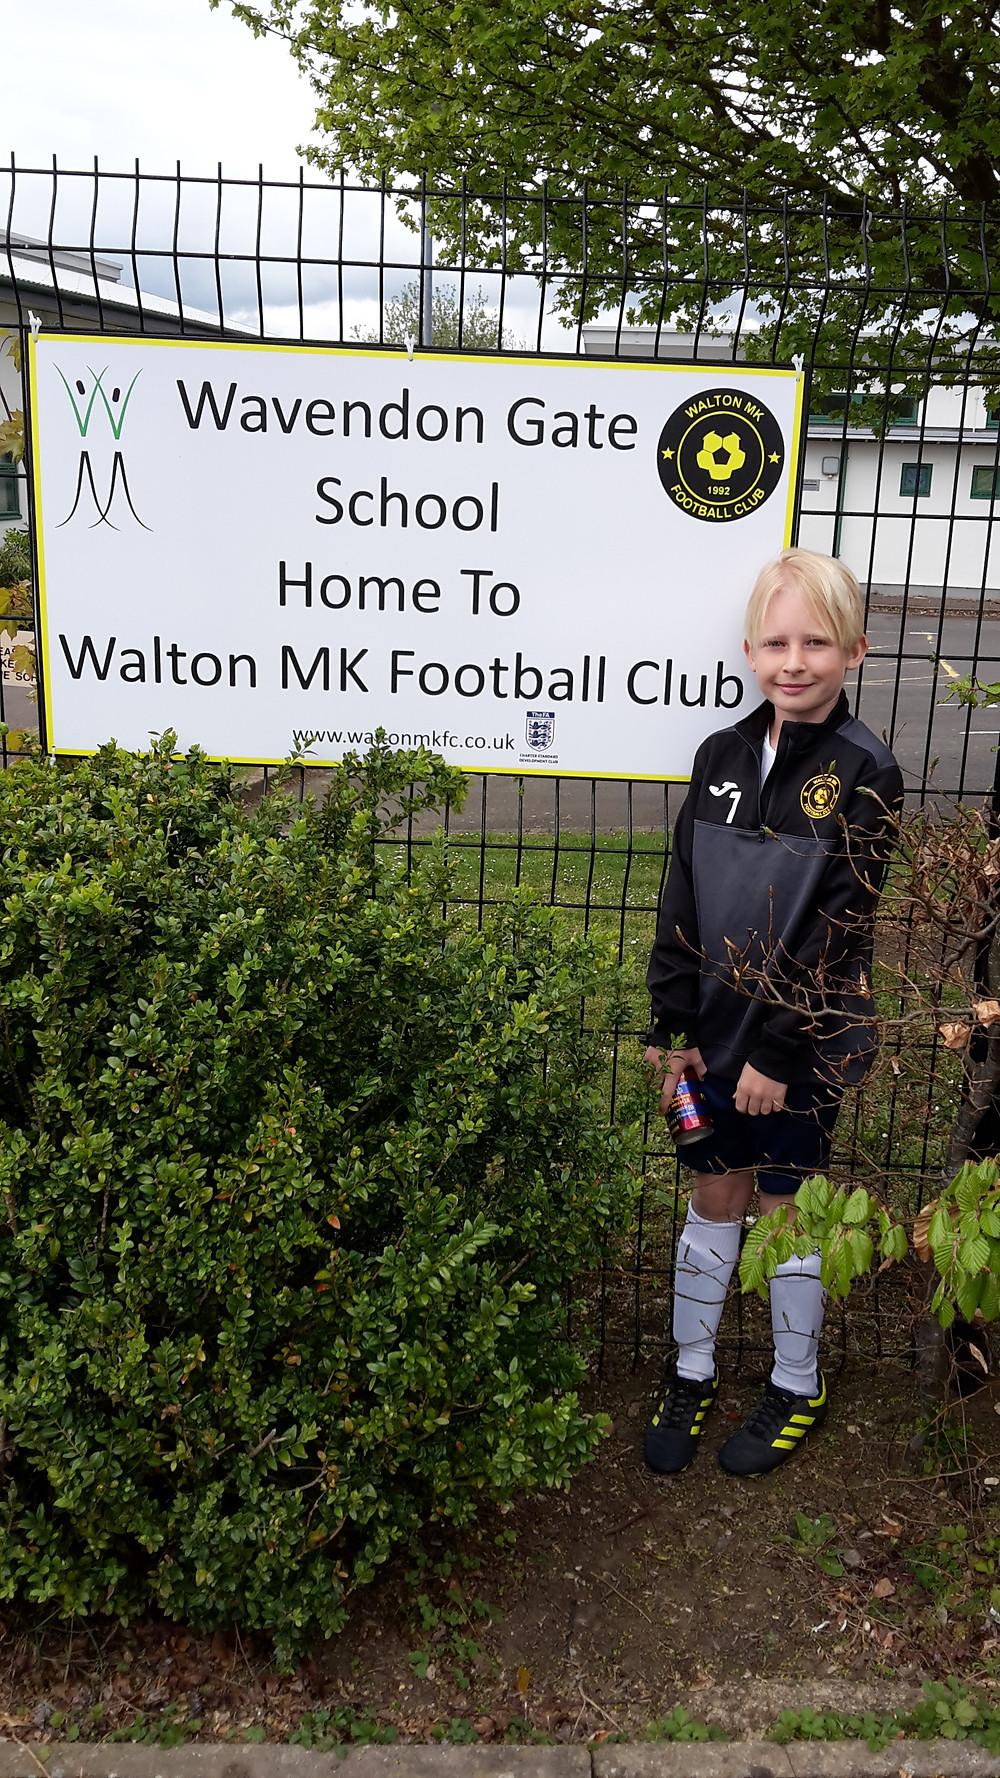 WALTON MK FC AND WAVENDON SCHOOL